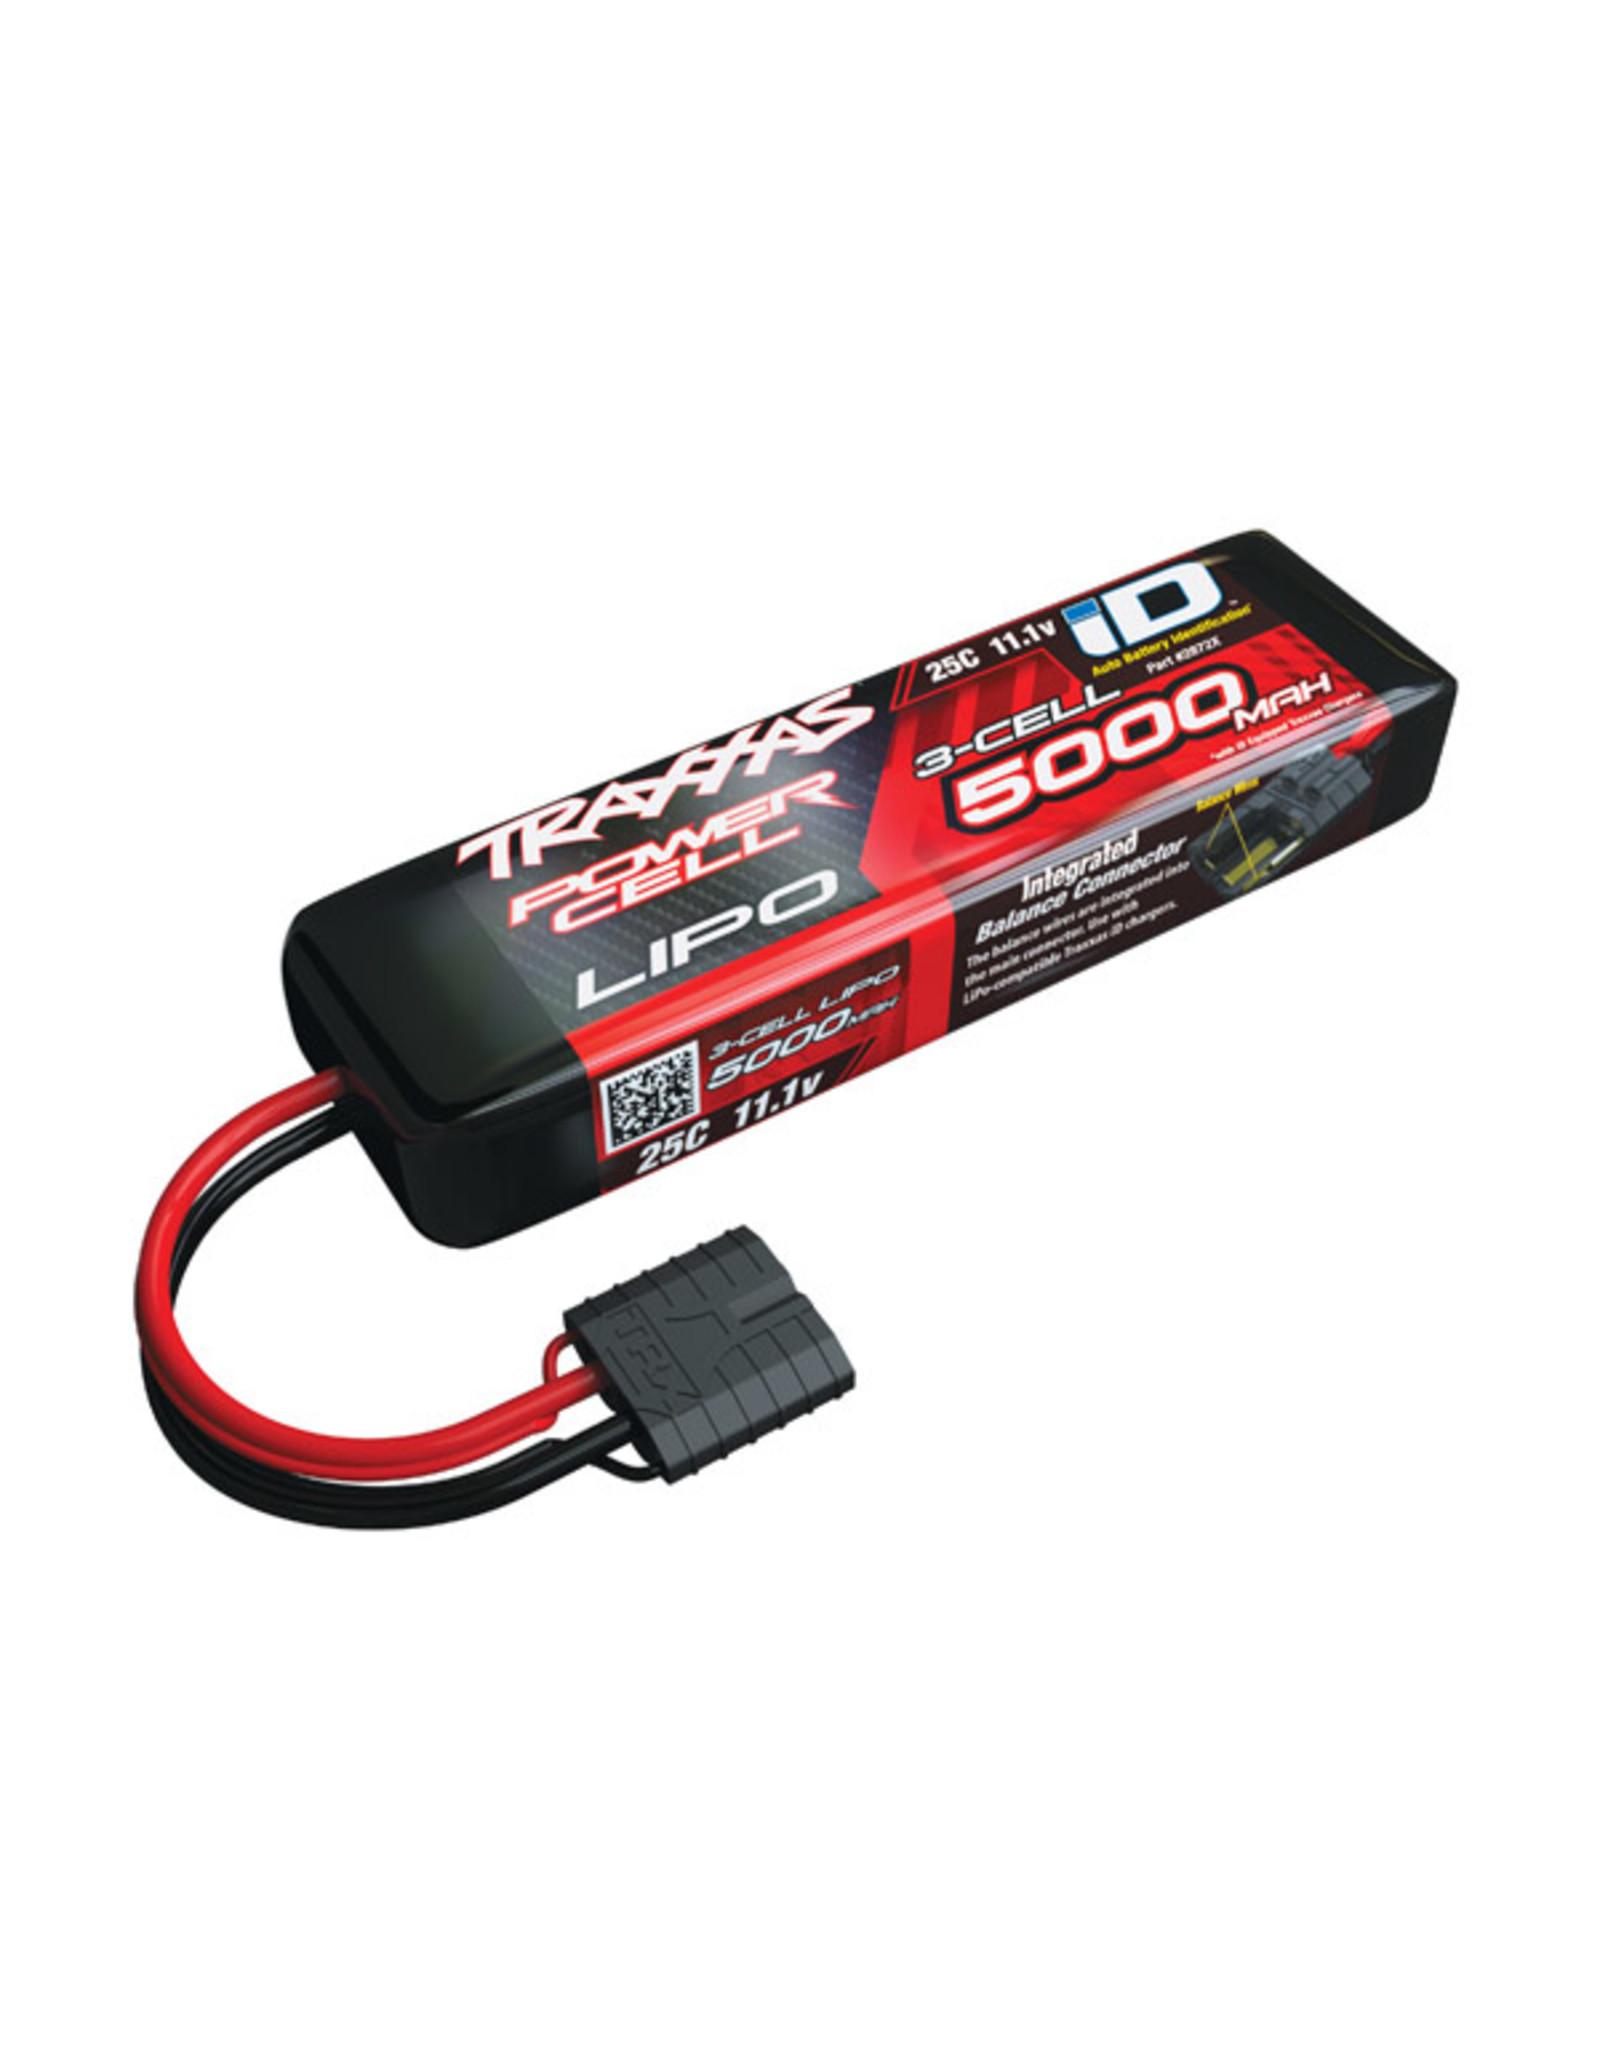 Traxxas 2872X - 5000mAh 11.1v 3-Cell 25C LiPo Battery